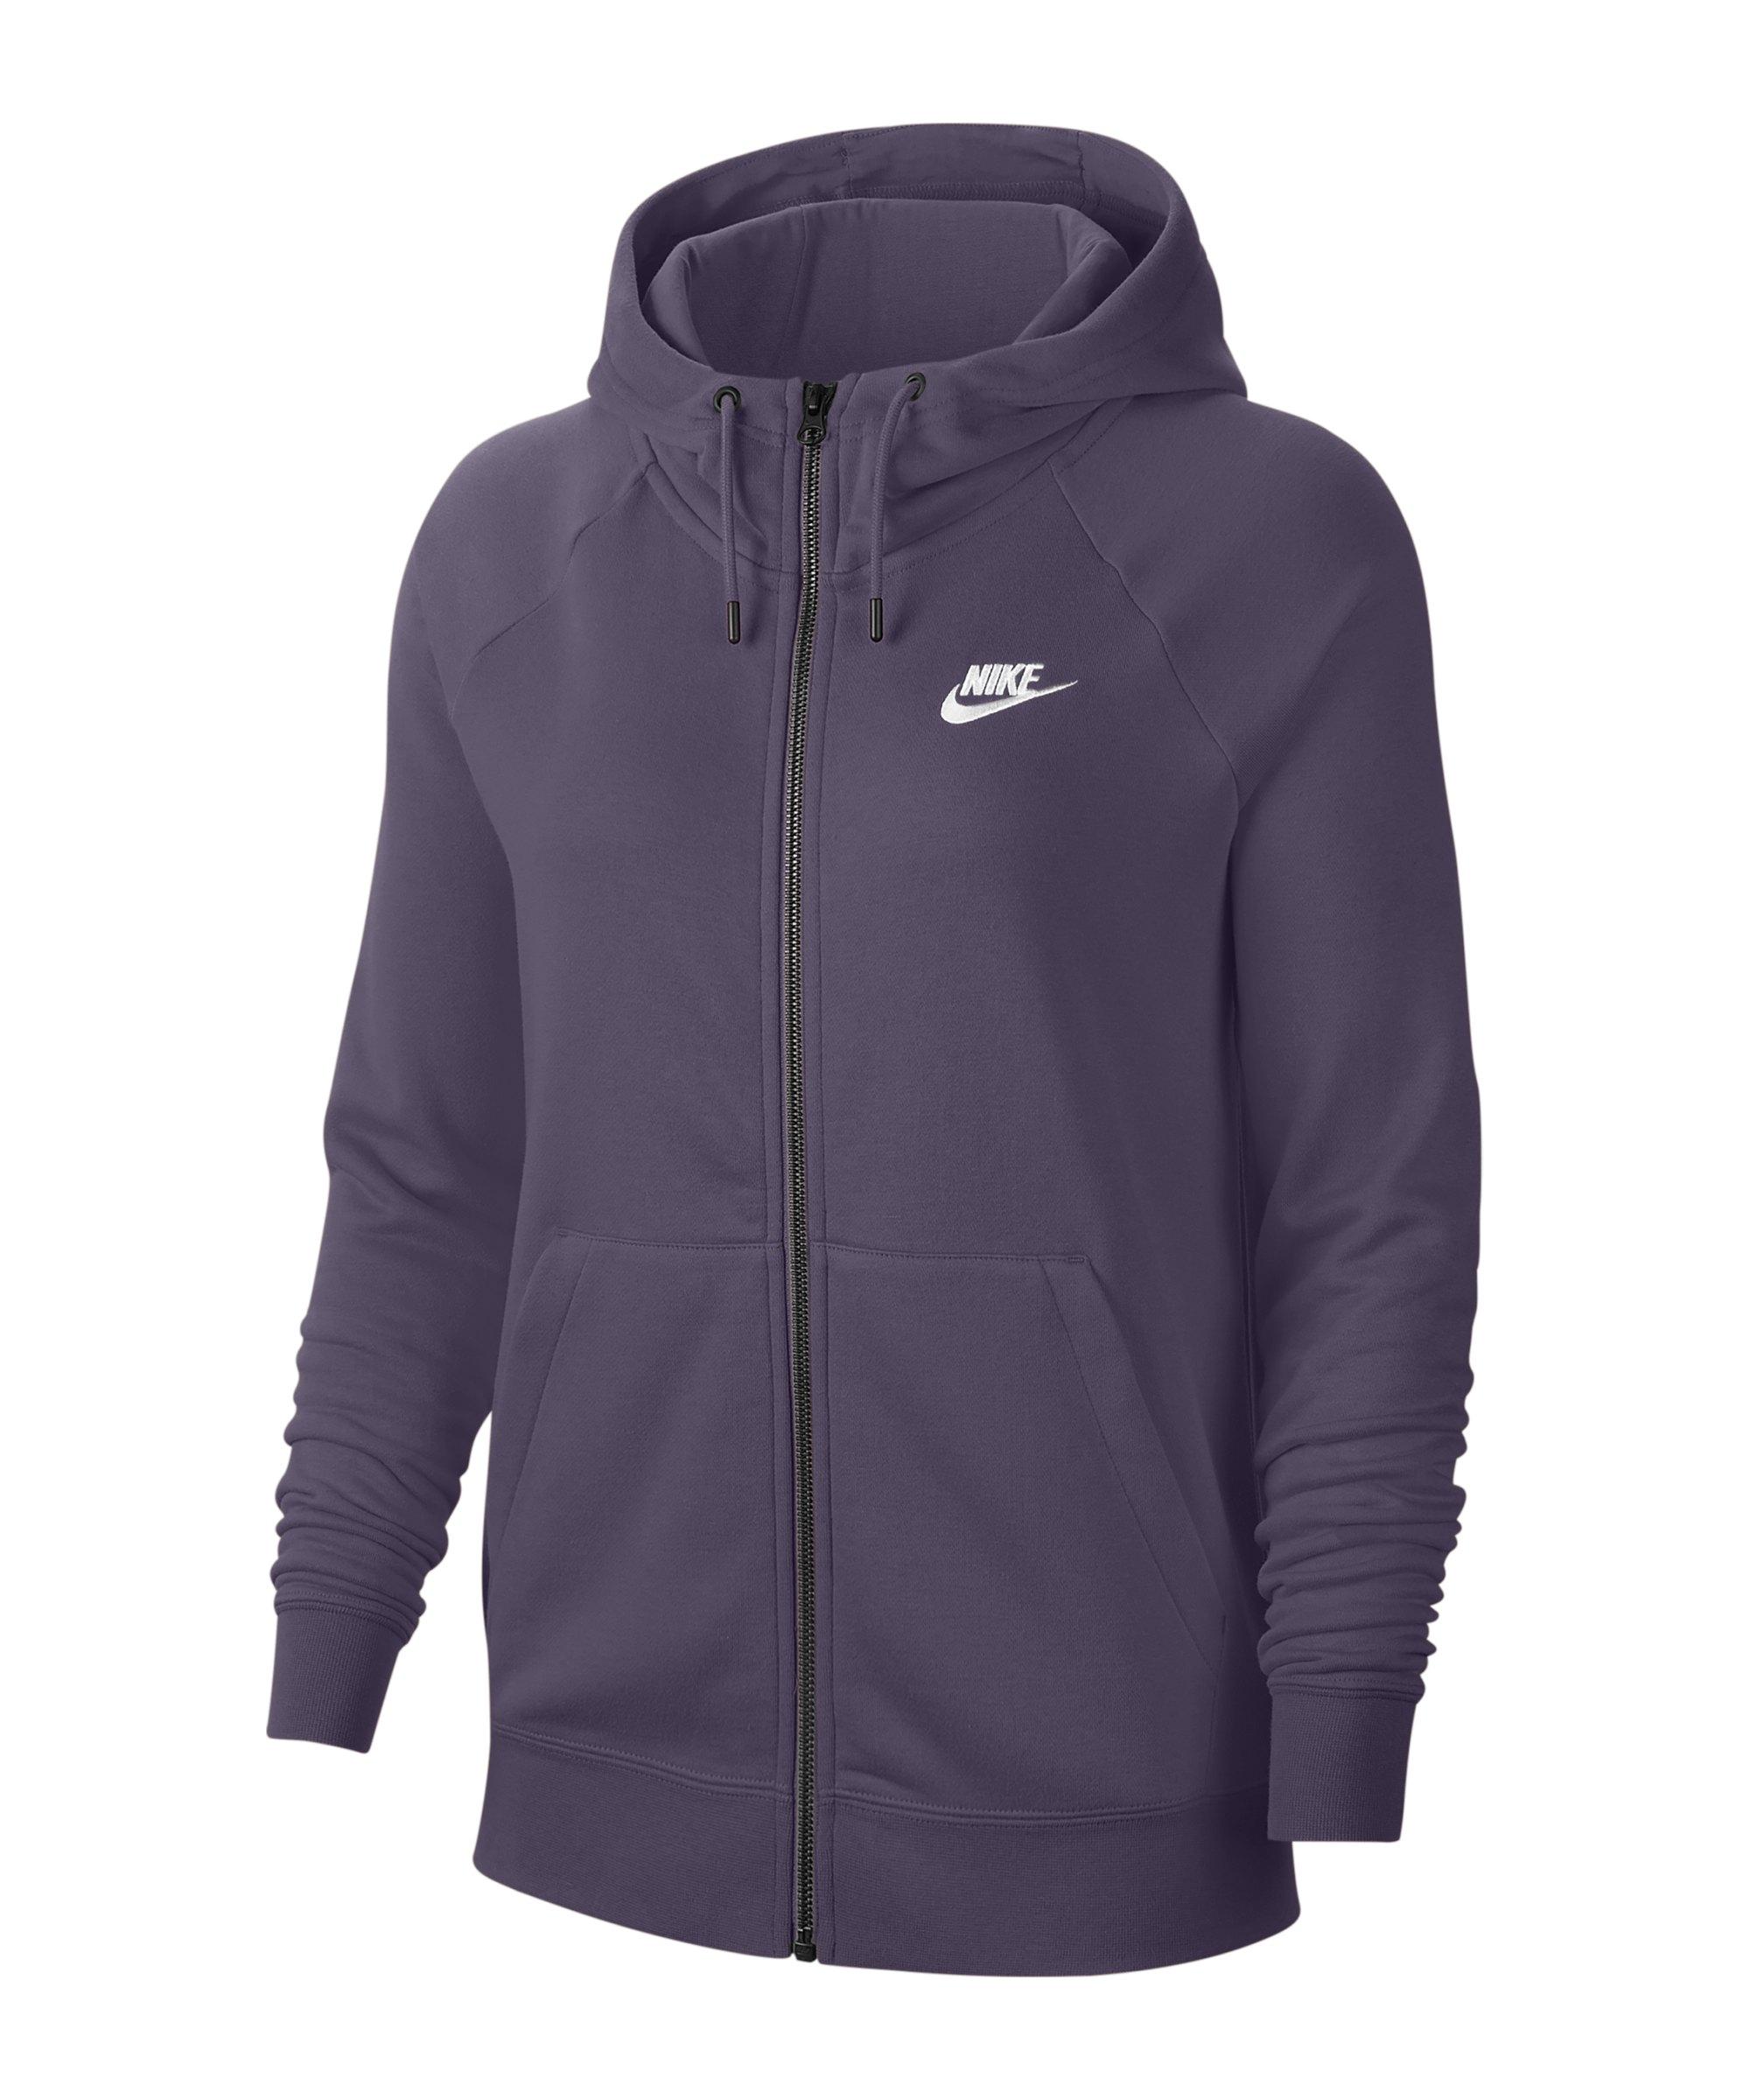 Nike Essential Fleece Kapuzenjacke Damen Lila F574 - lila